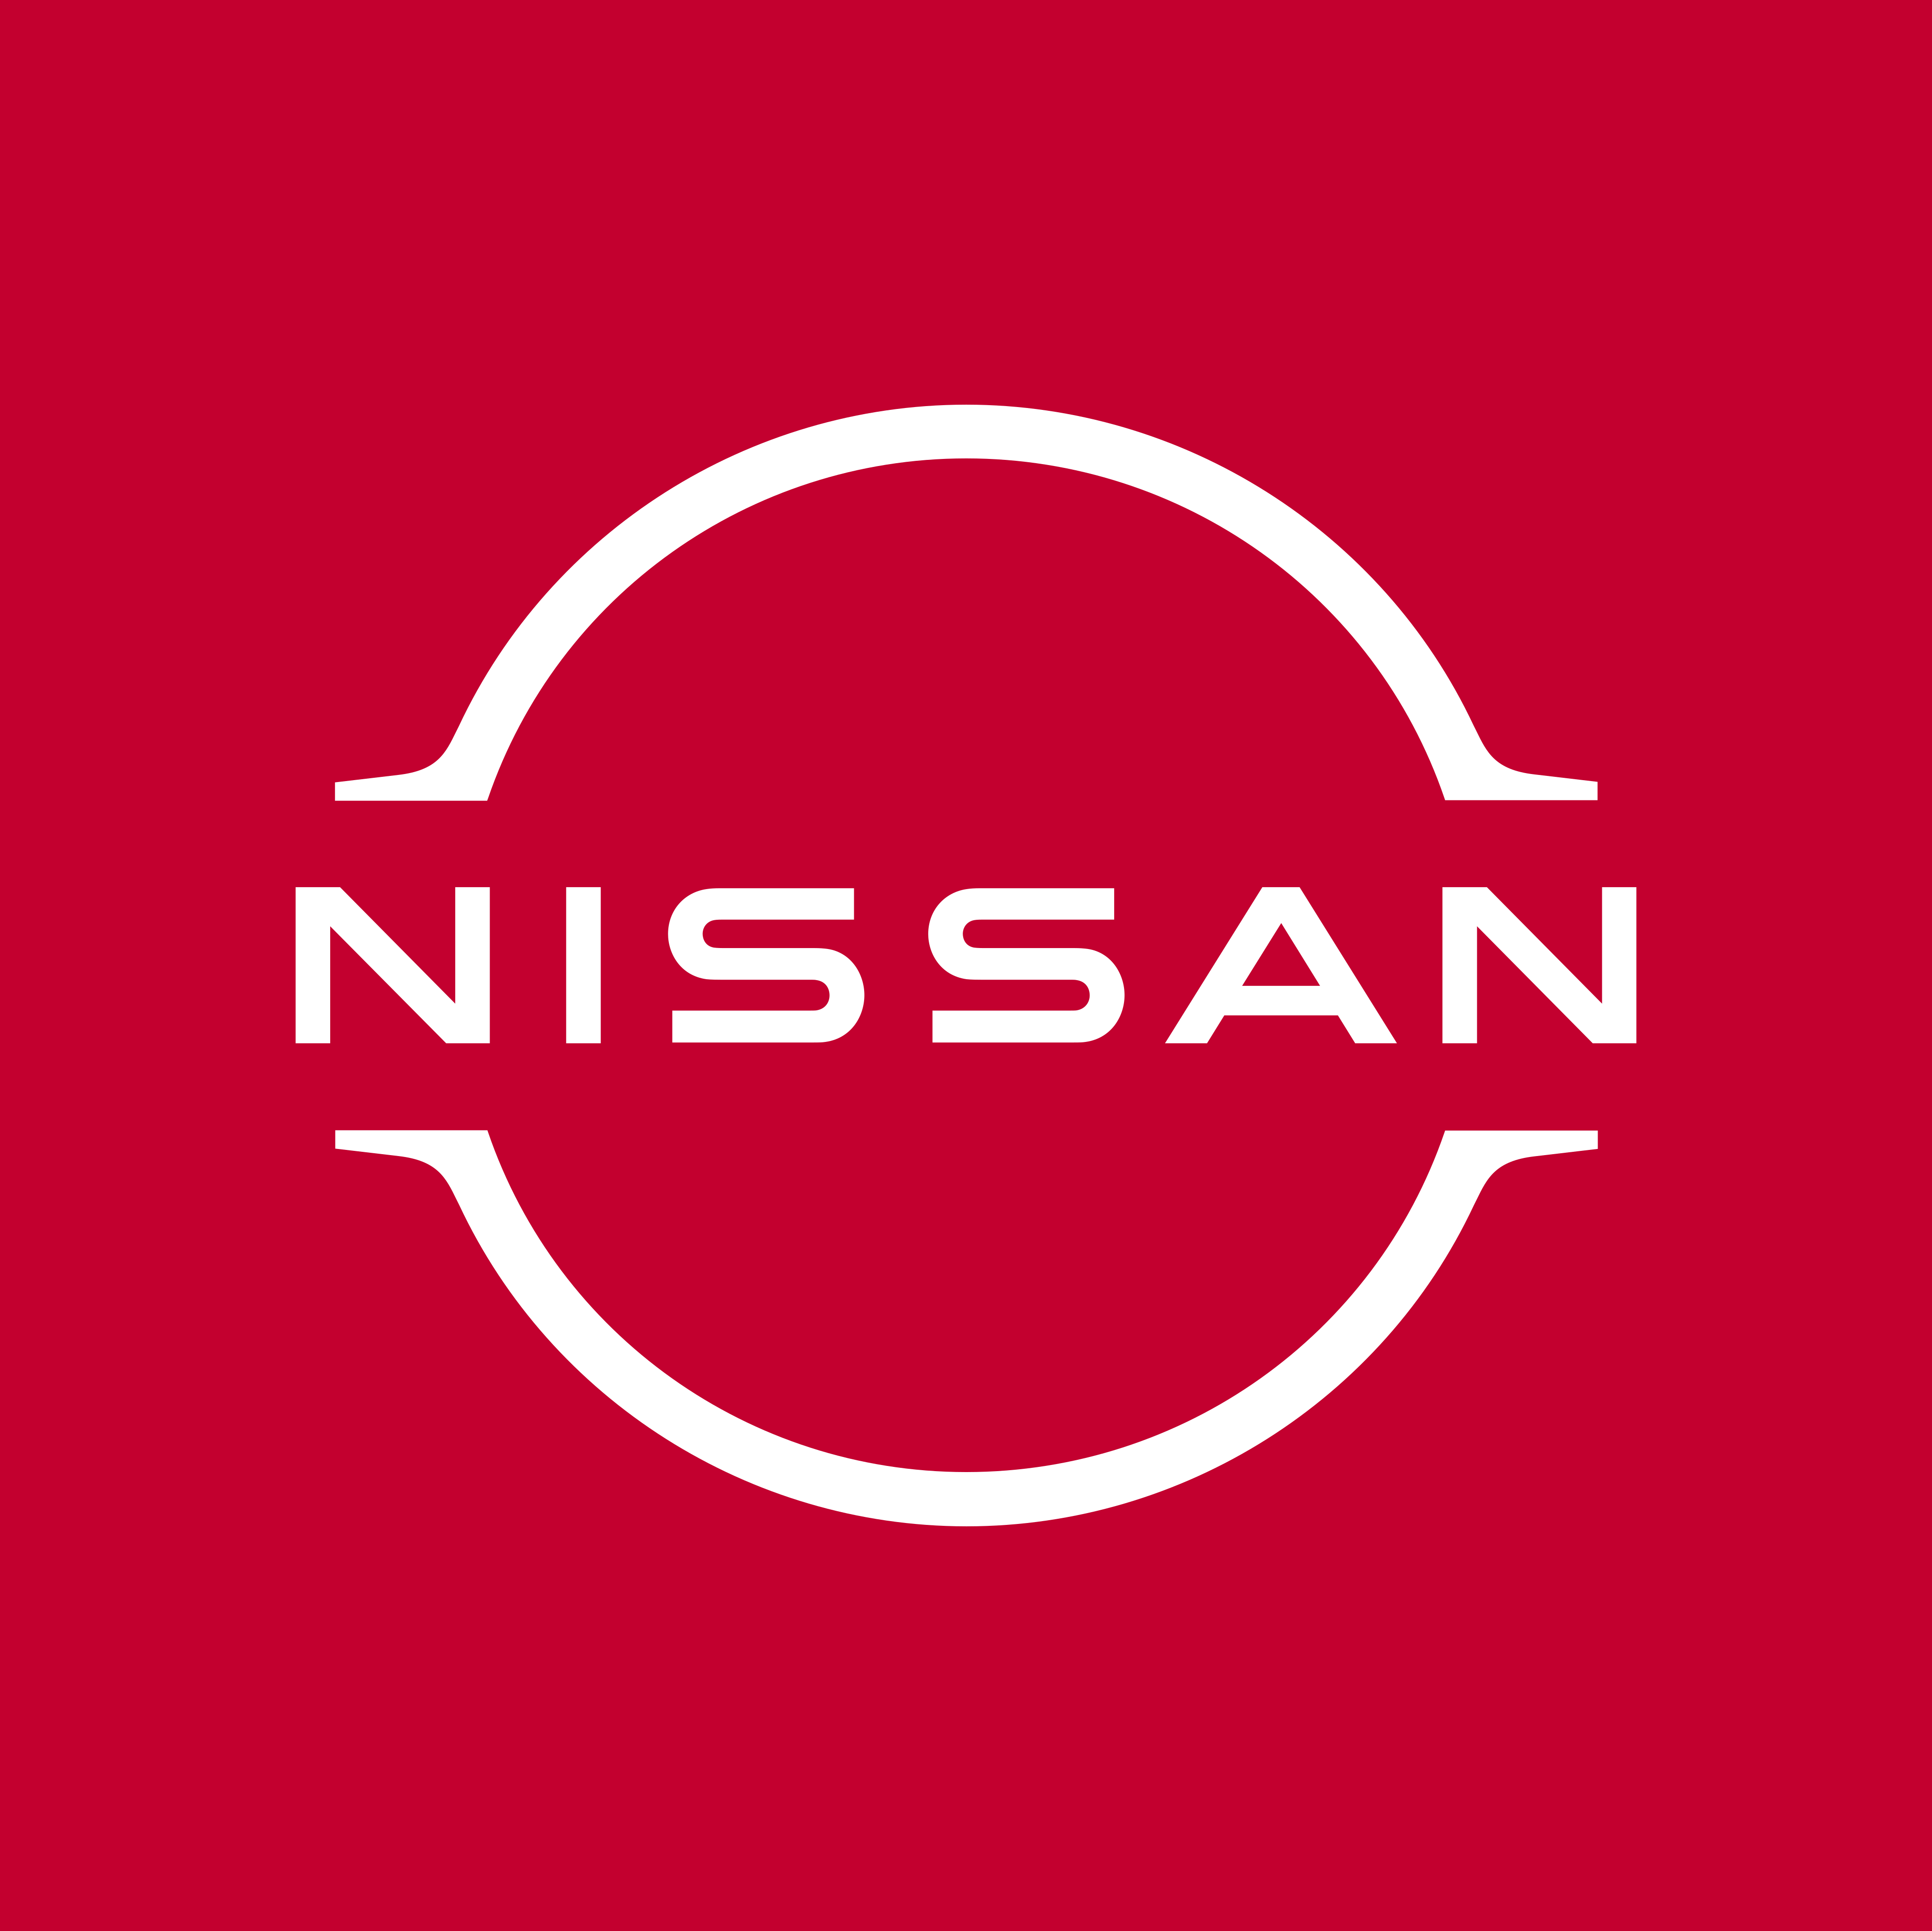 nissan logo 7 - Nissan Logo